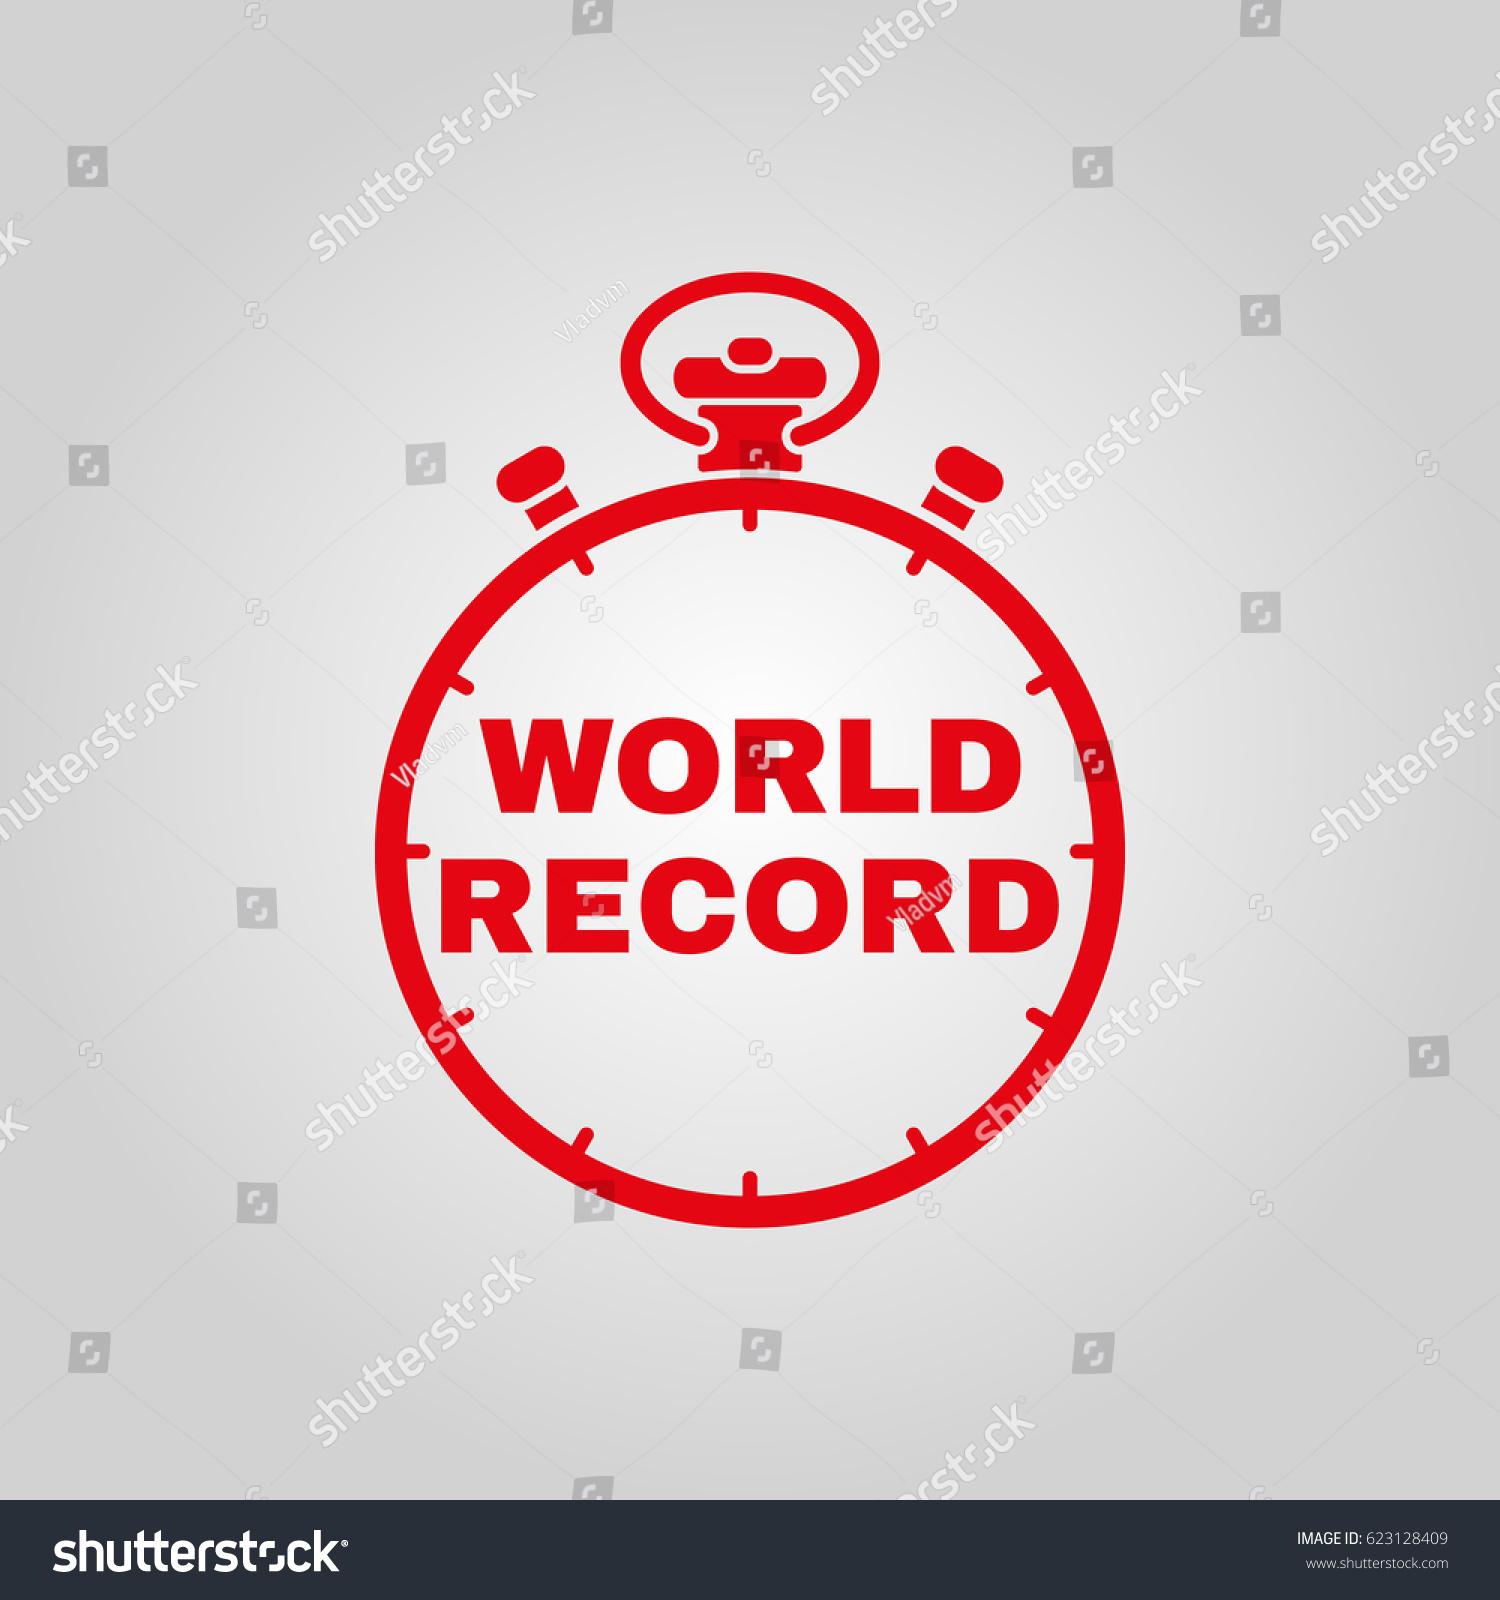 Stopwatch word world record icon symbol stock vector 623128409 stopwatch with the word world record icon symbol flat design stock vector buycottarizona